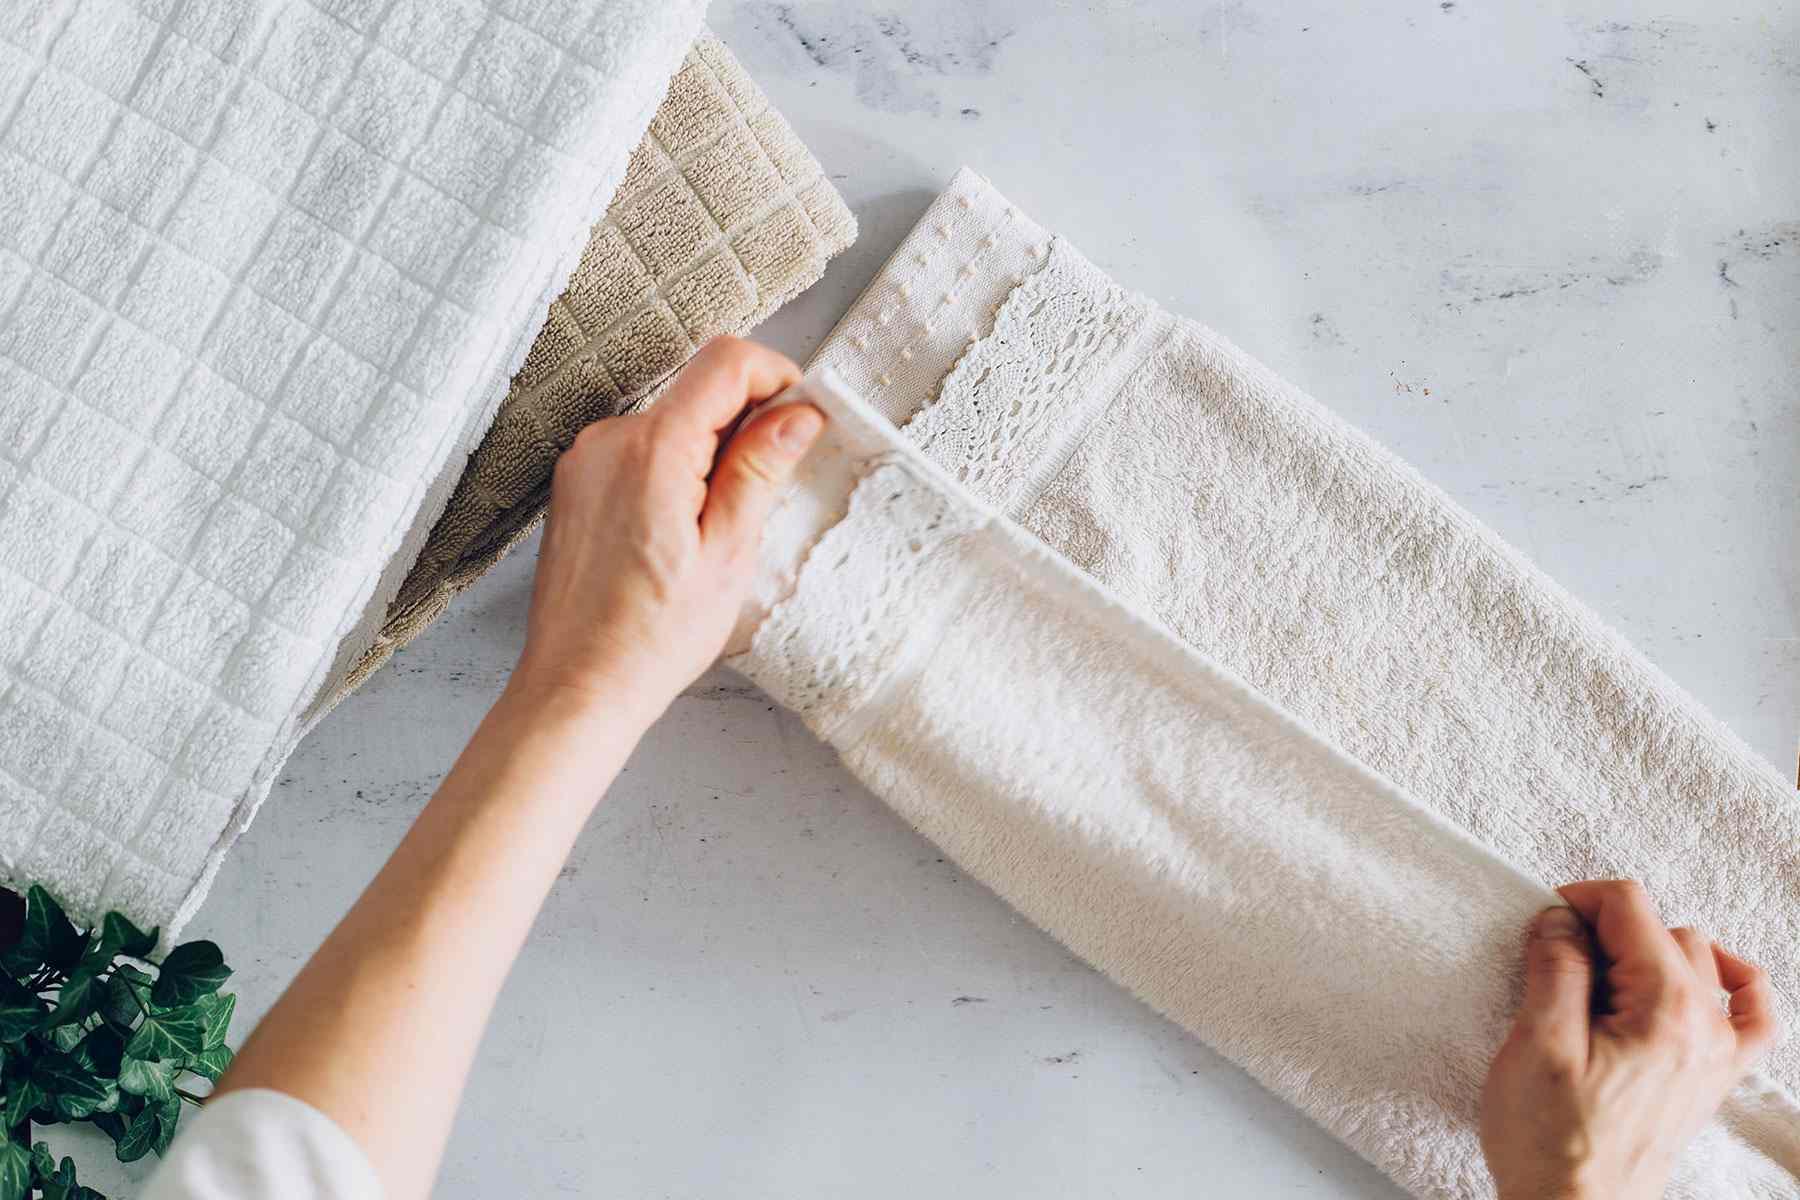 person folding a towel